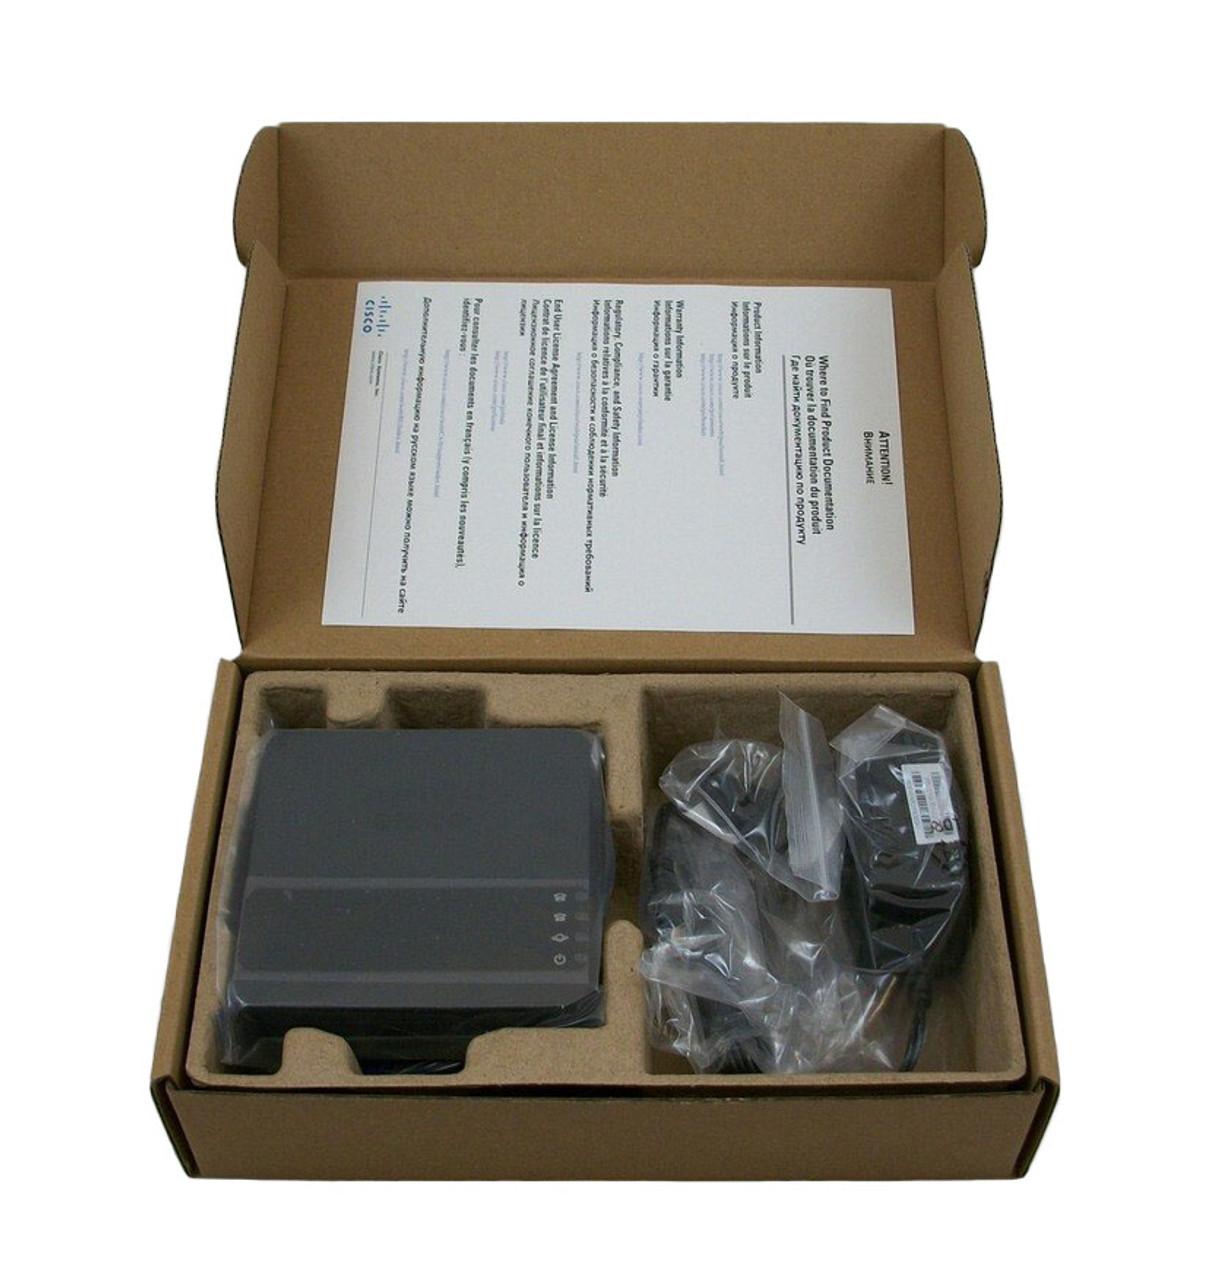 Cisco ATA 190 Analog Telephone Adapter with Power ATA190